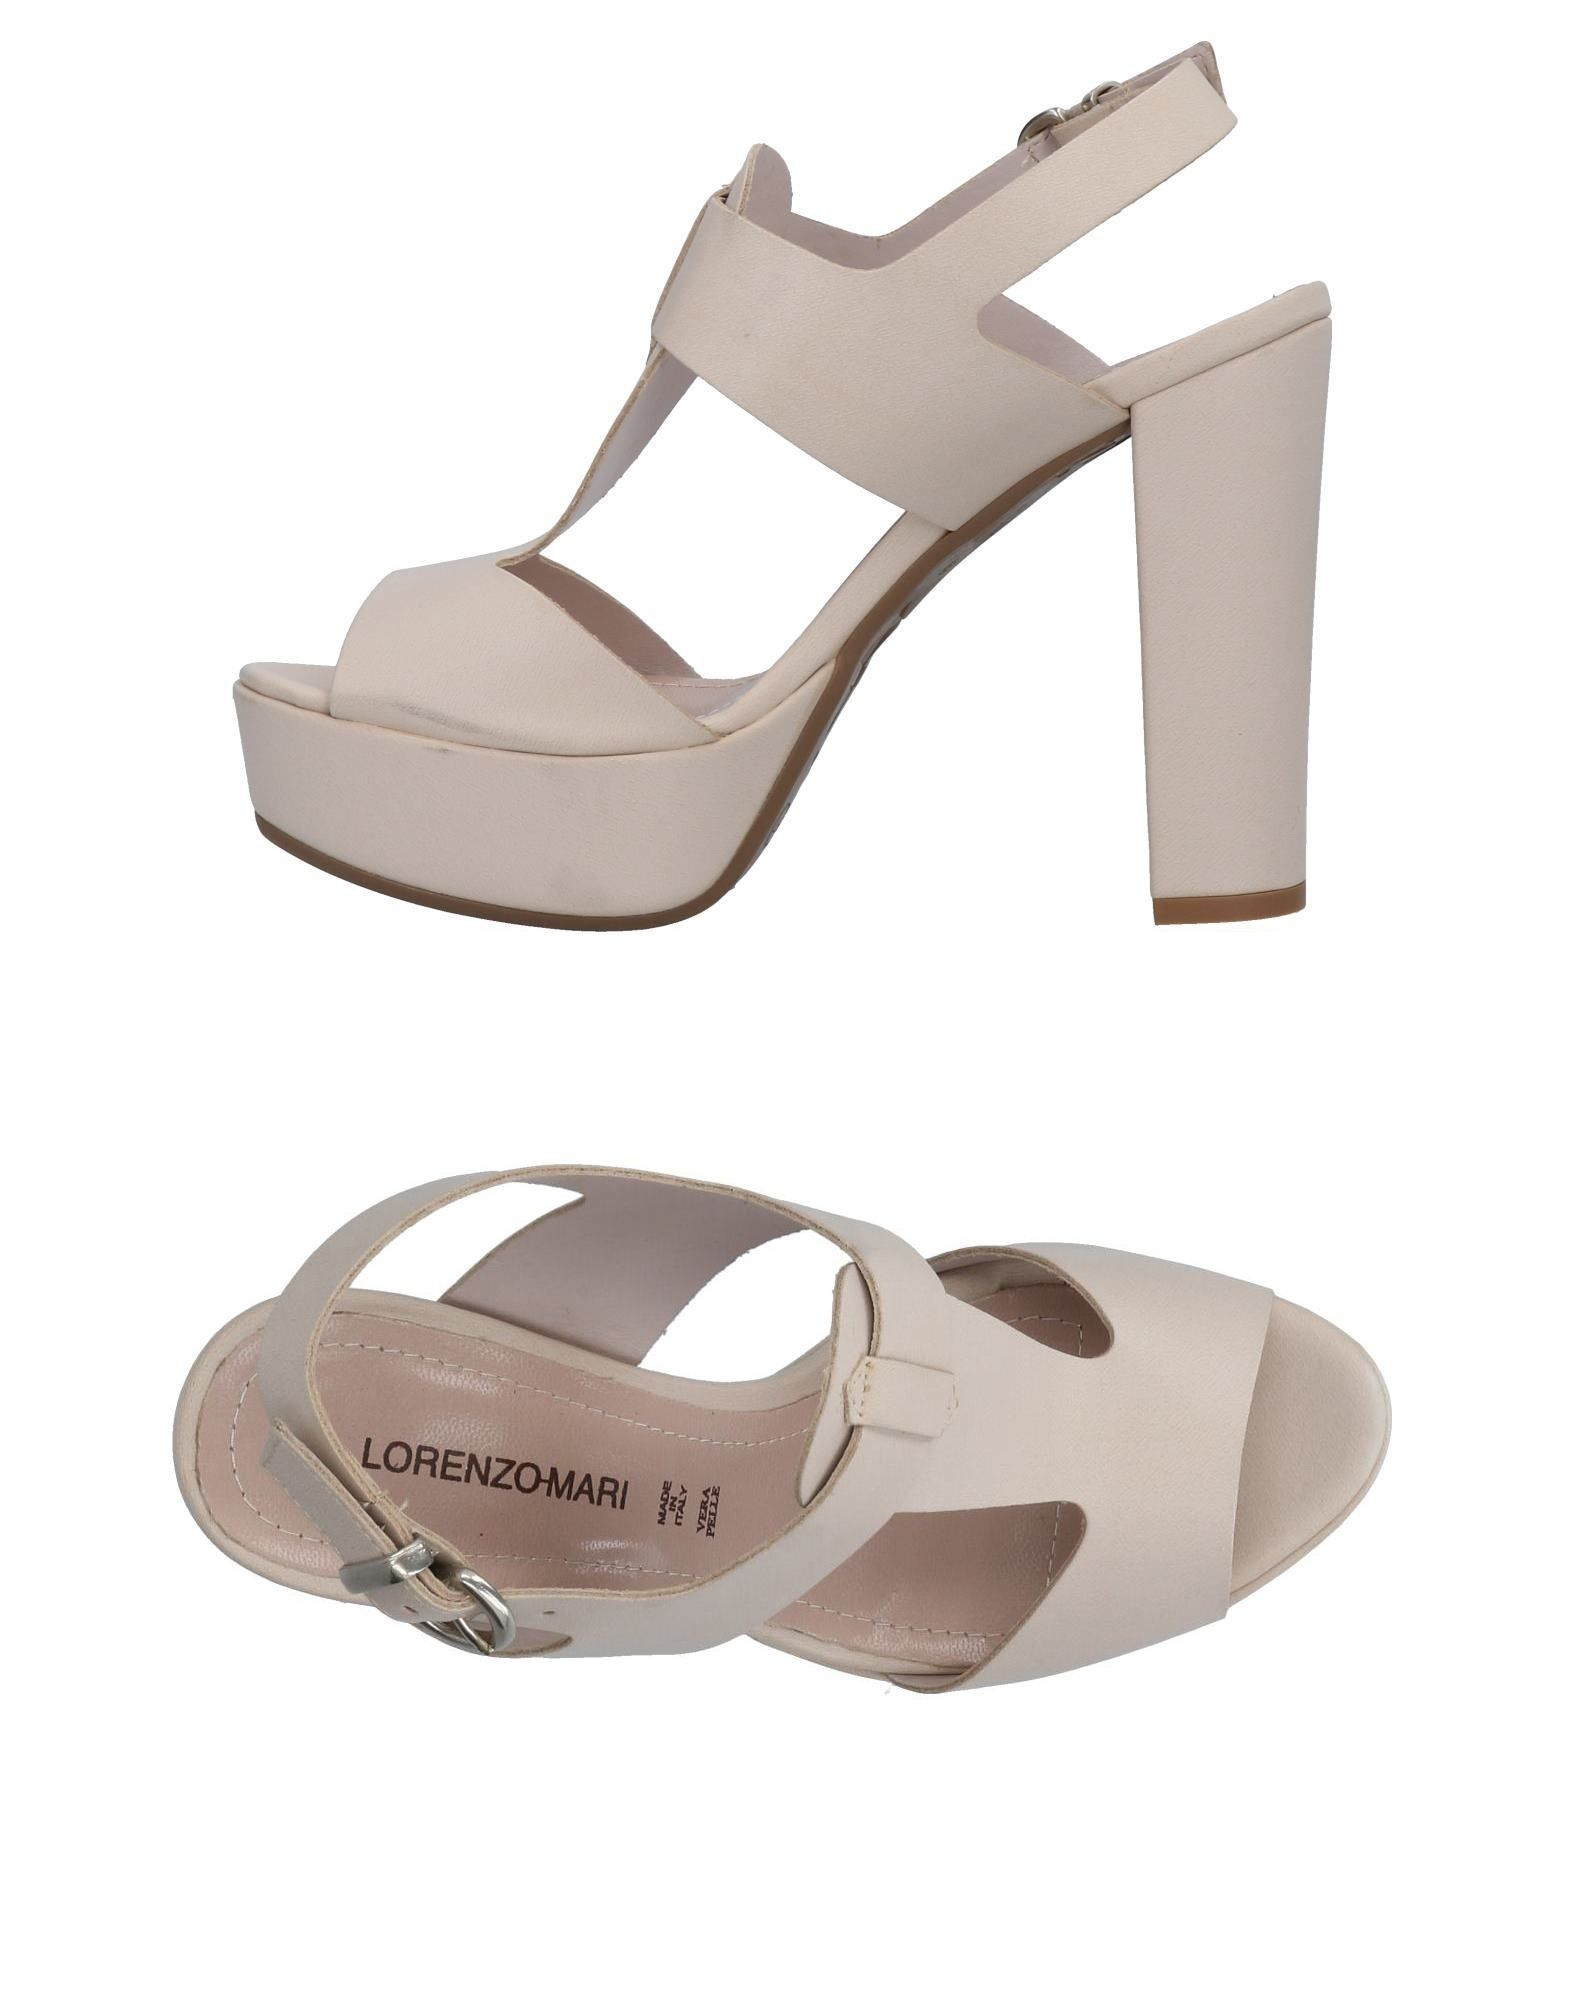 Lorenzo Mari Sandals Sandals - Women Lorenzo Mari Sandals Sandals online on  Canada - 11484115JF a7cd56